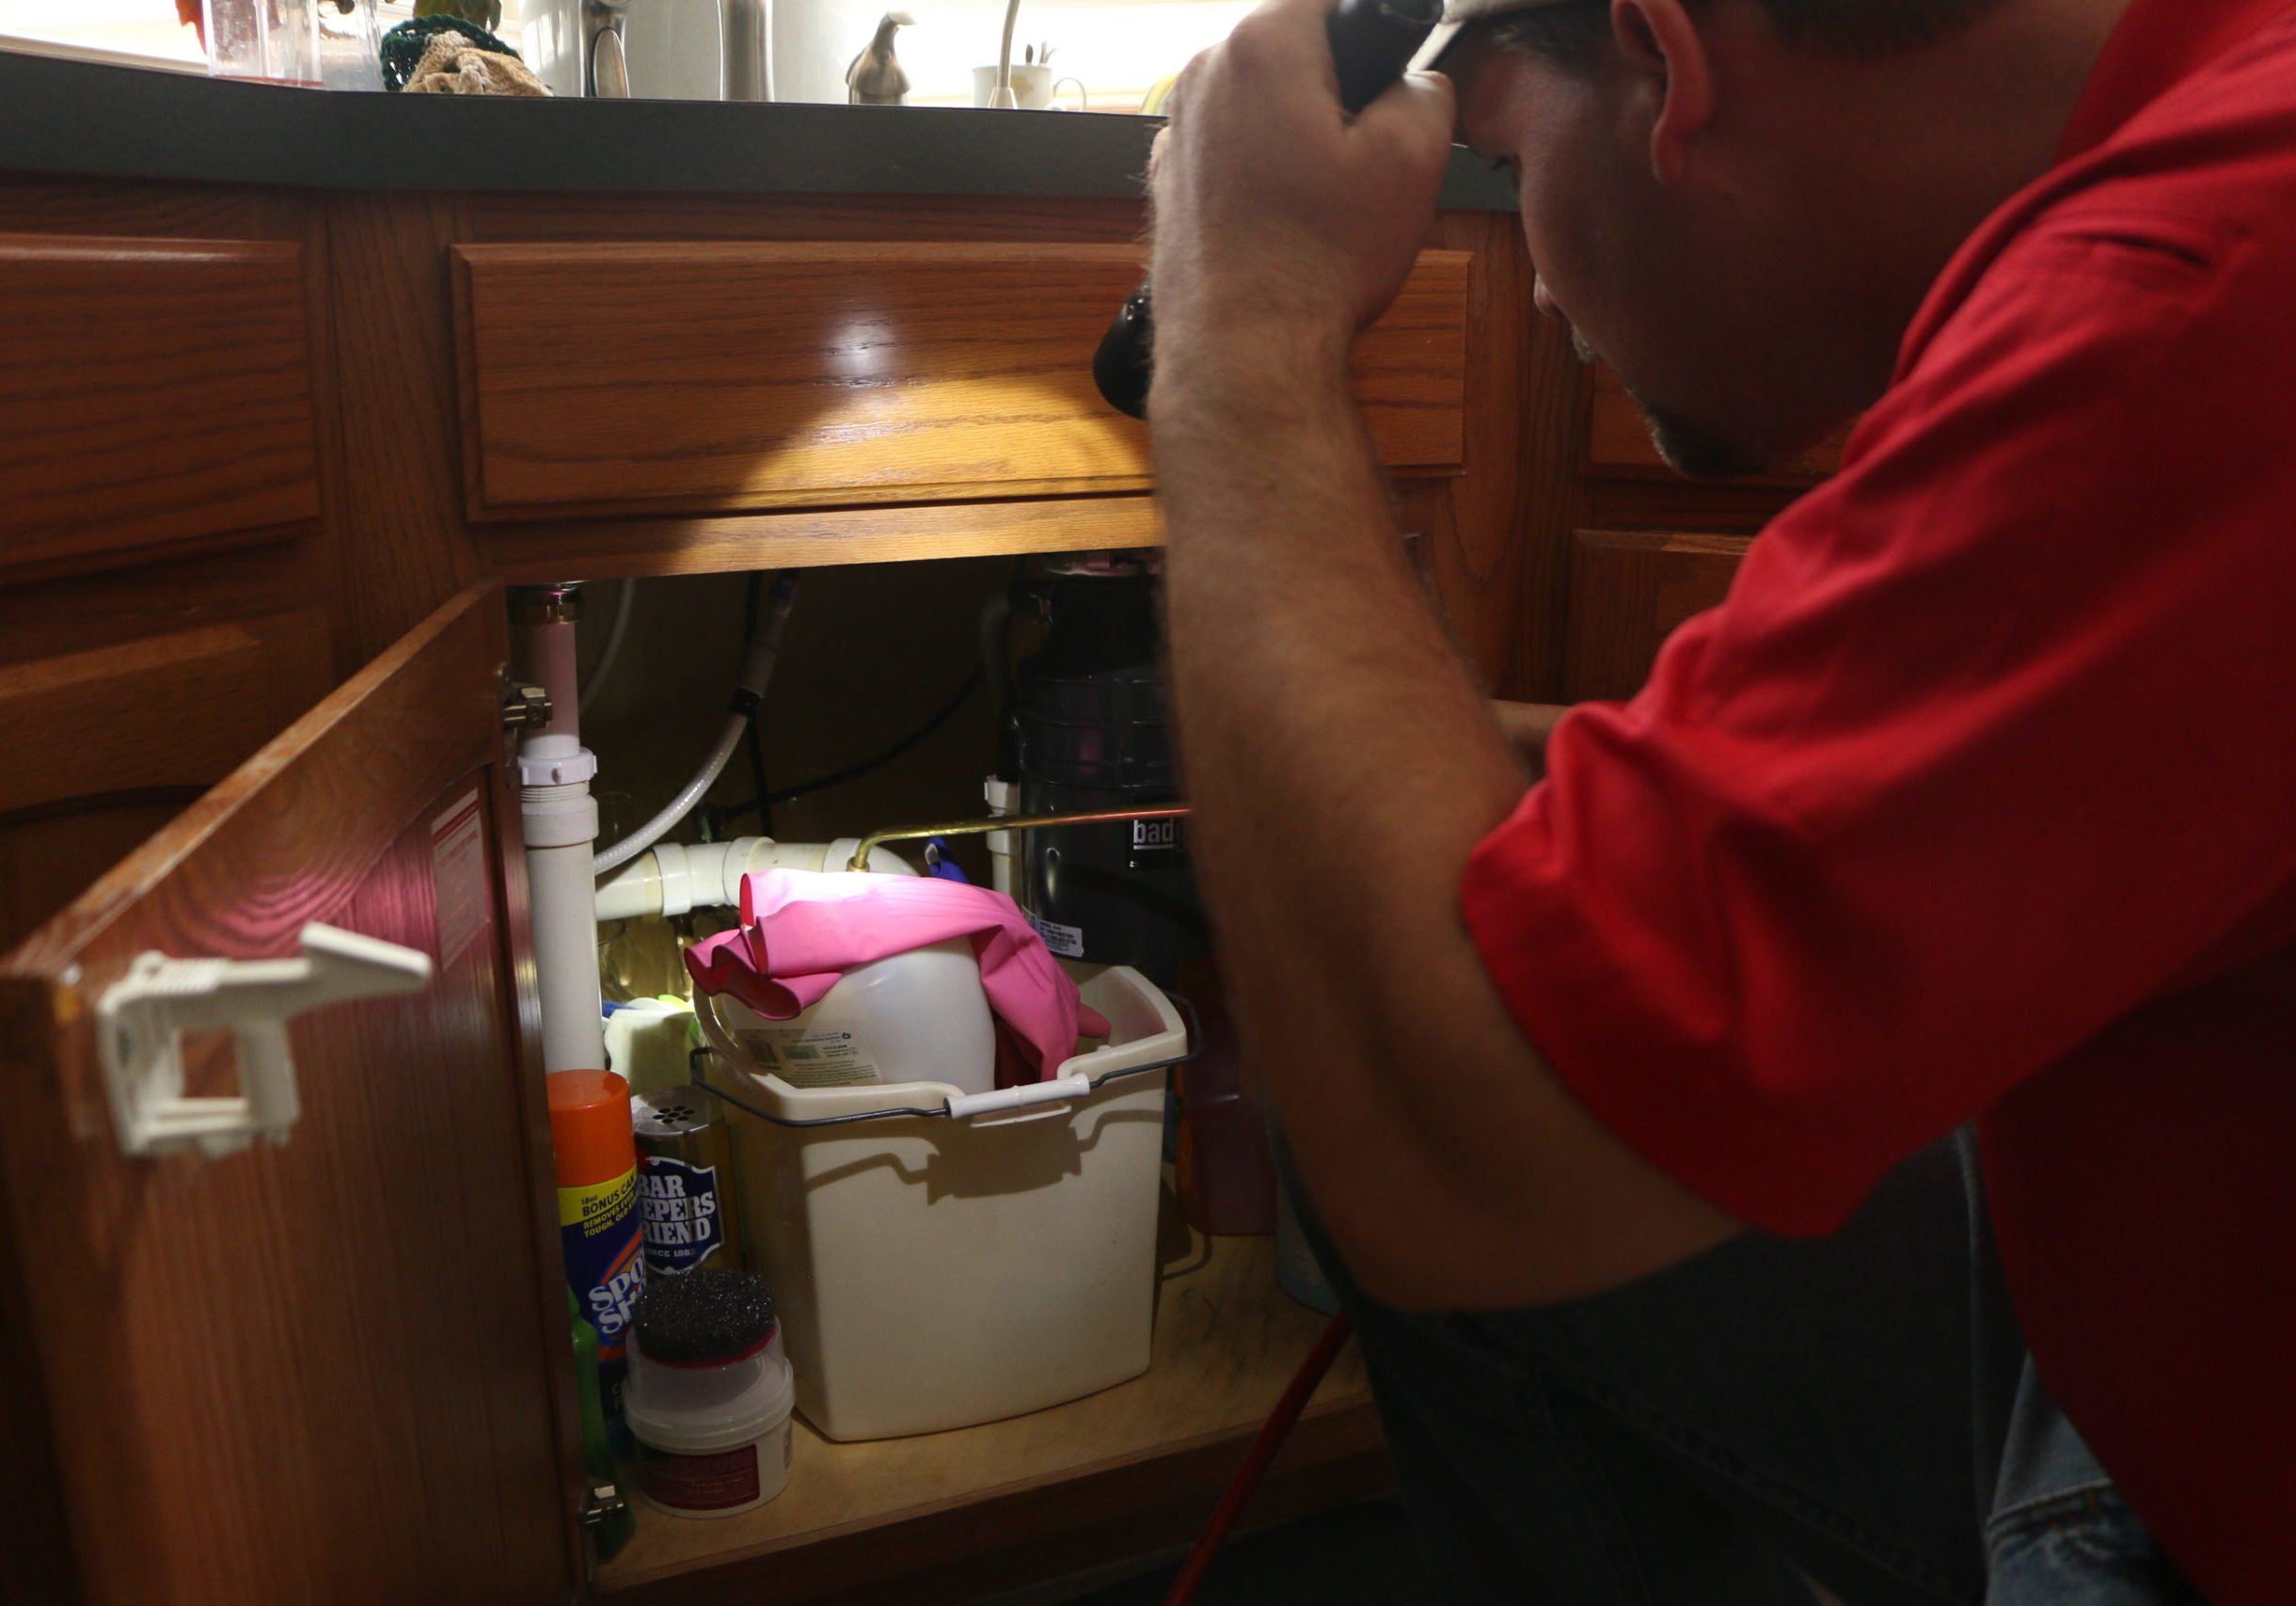 Pest control technician shining flashlight under kitchen sink